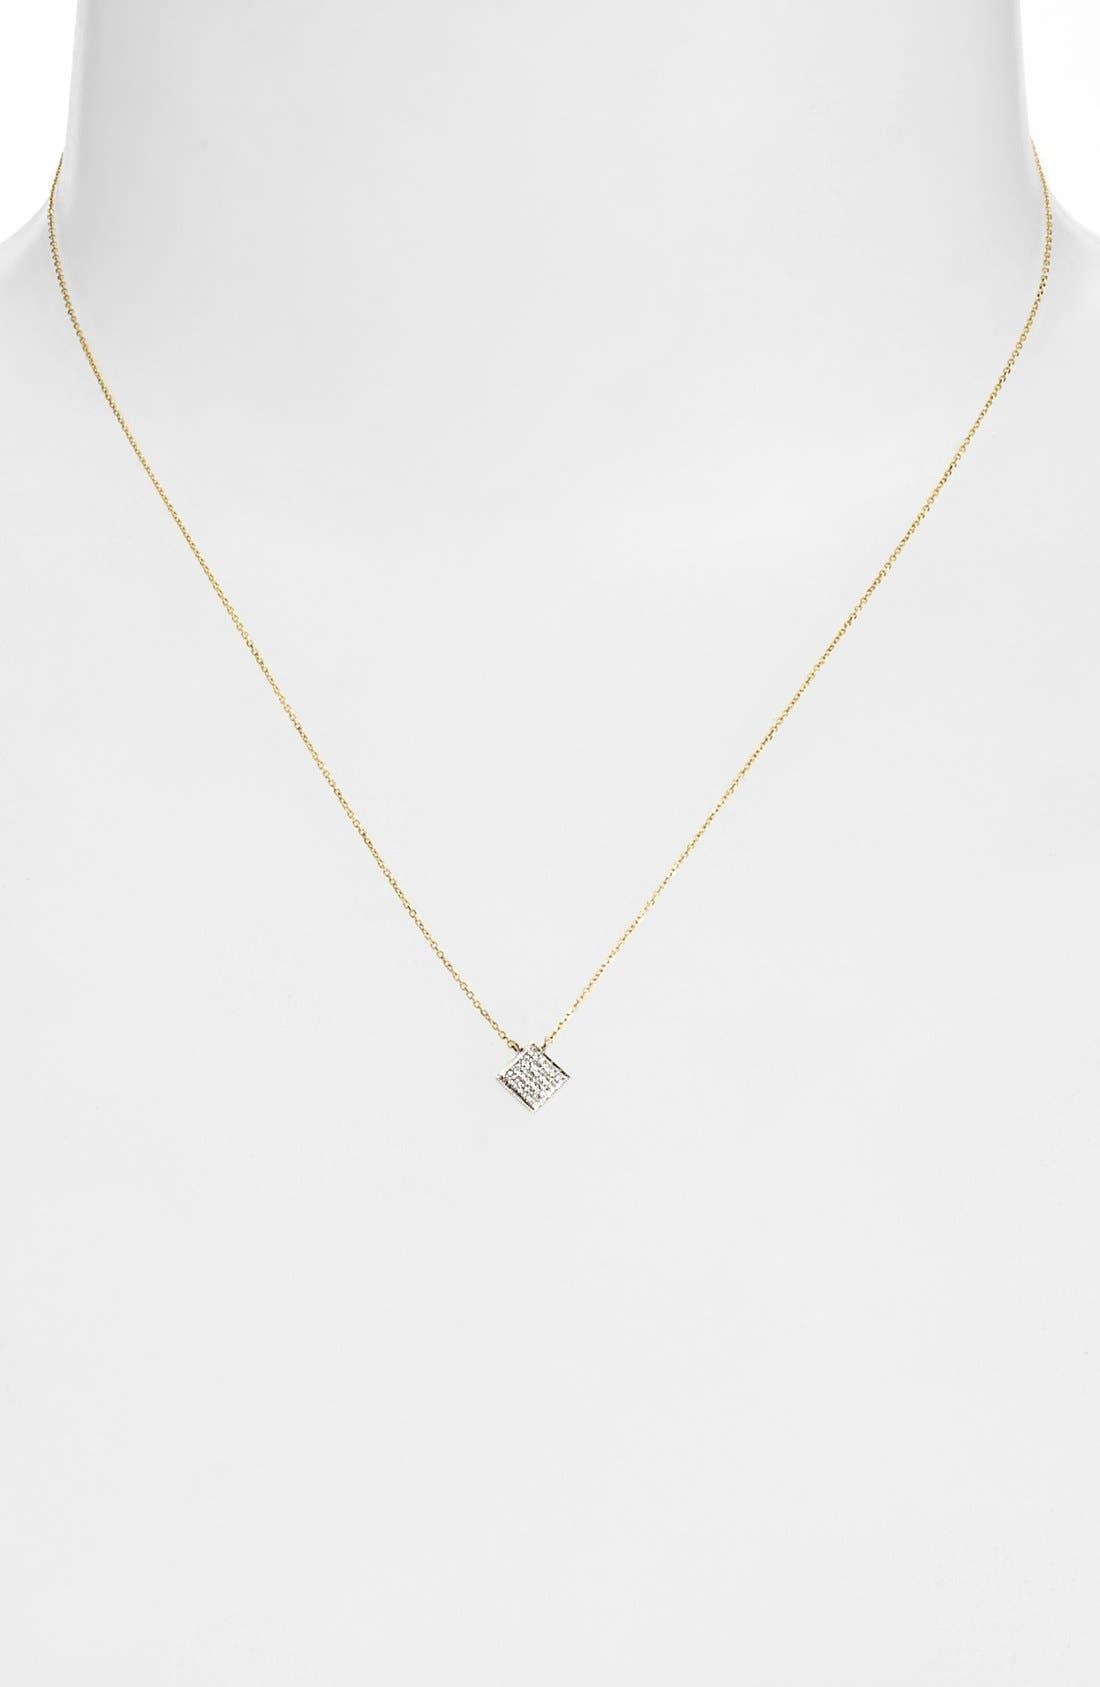 Alternate Image 2  - Dana Rebecca Designs 'Lisa Michelle' Diamond Pavé Square Pendant Necklace (Nordstrom Exclusive)